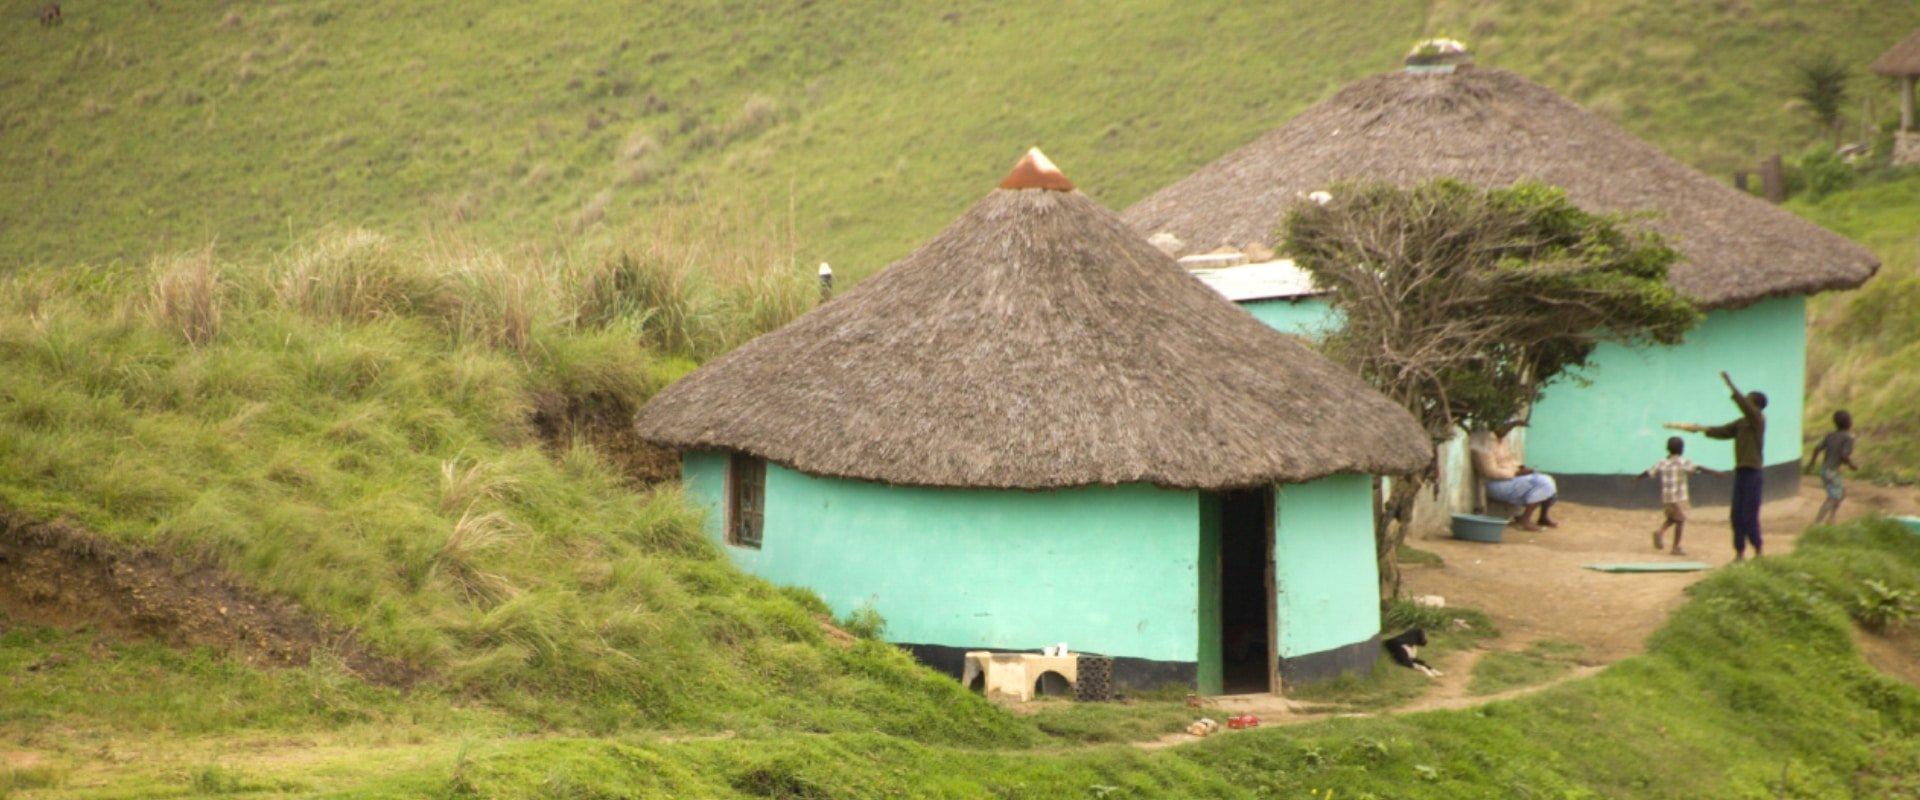 Visit the local Pondo village